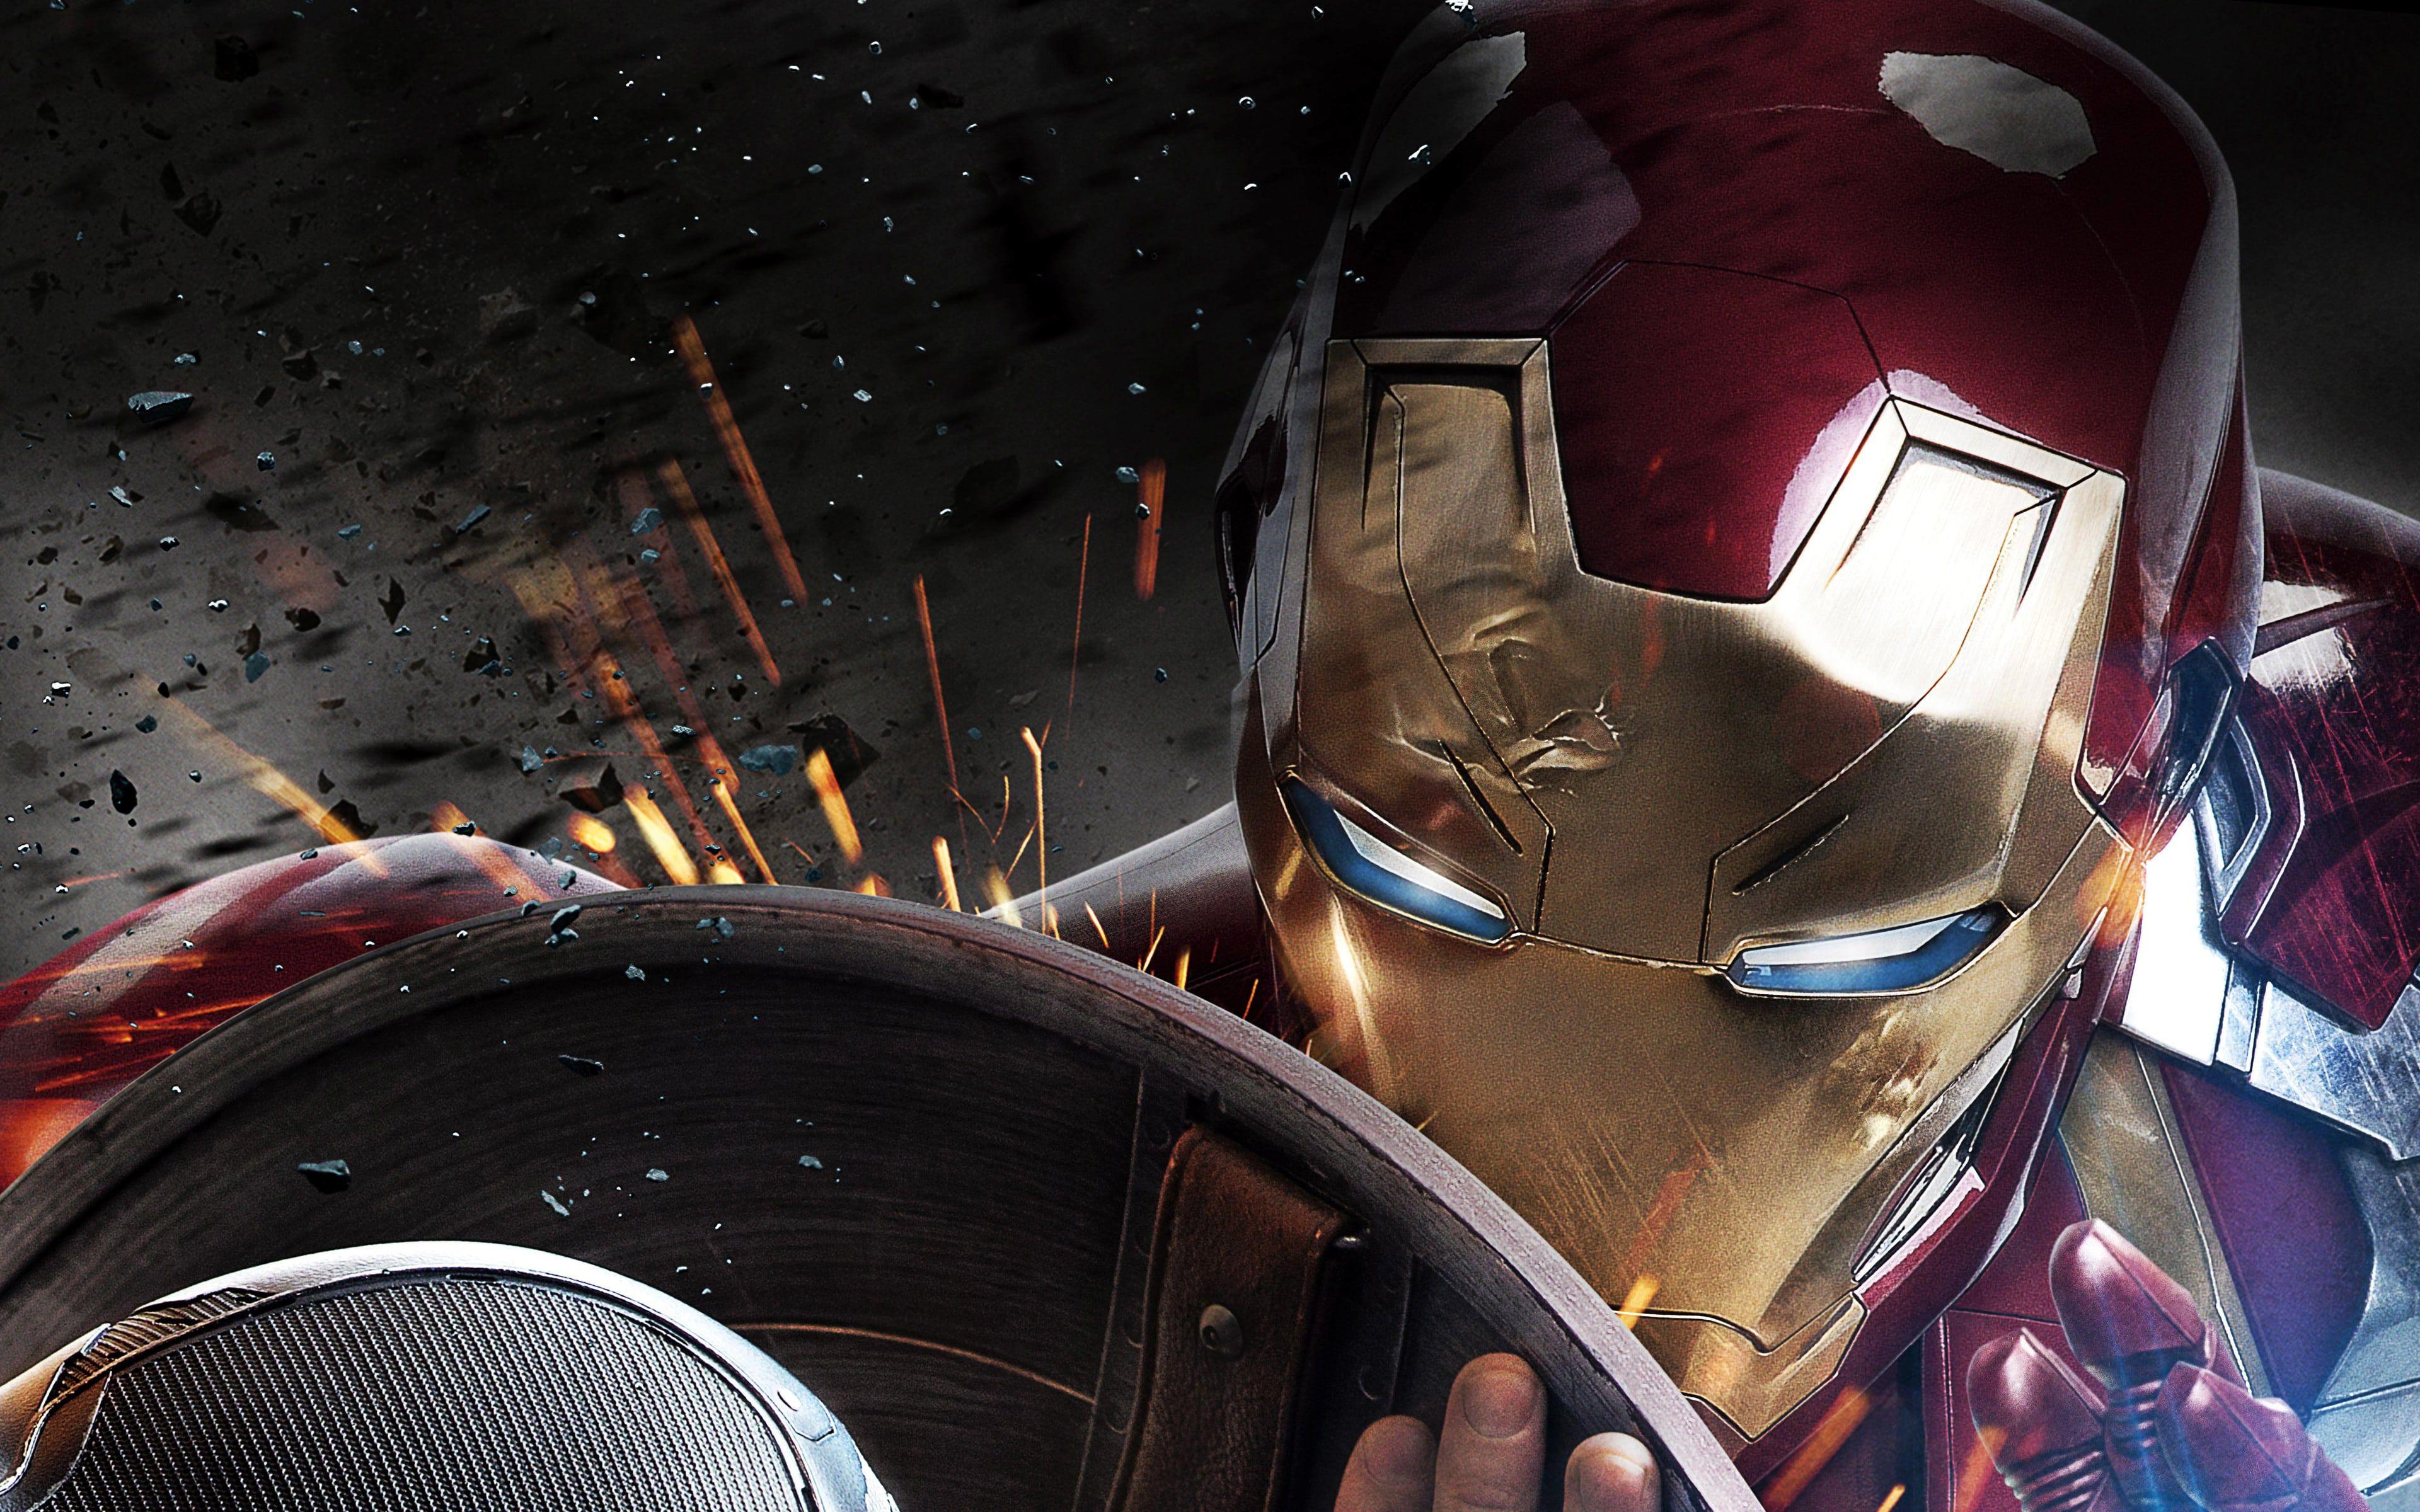 marvel super heroes iron man | pinterest | marvel super heroes